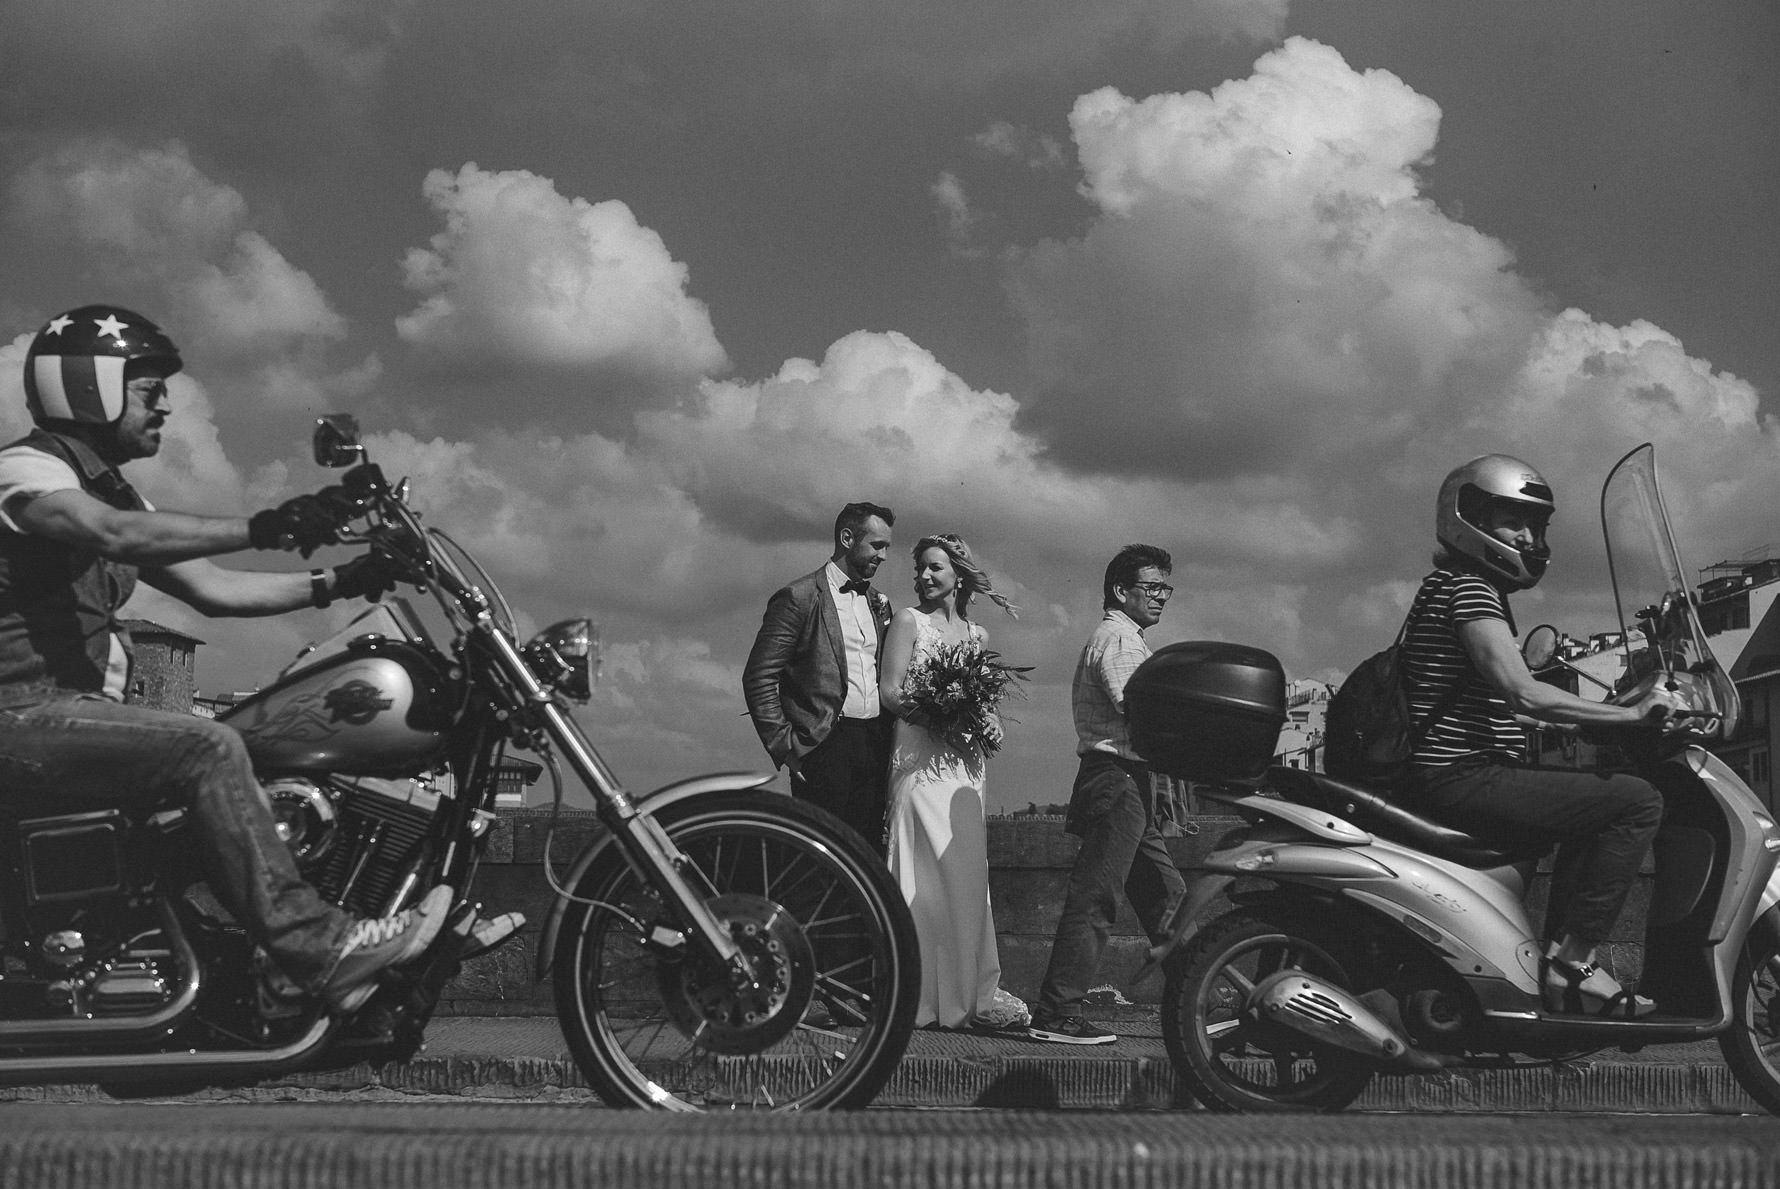 Florence wedding Photographer - Livio Lacurre